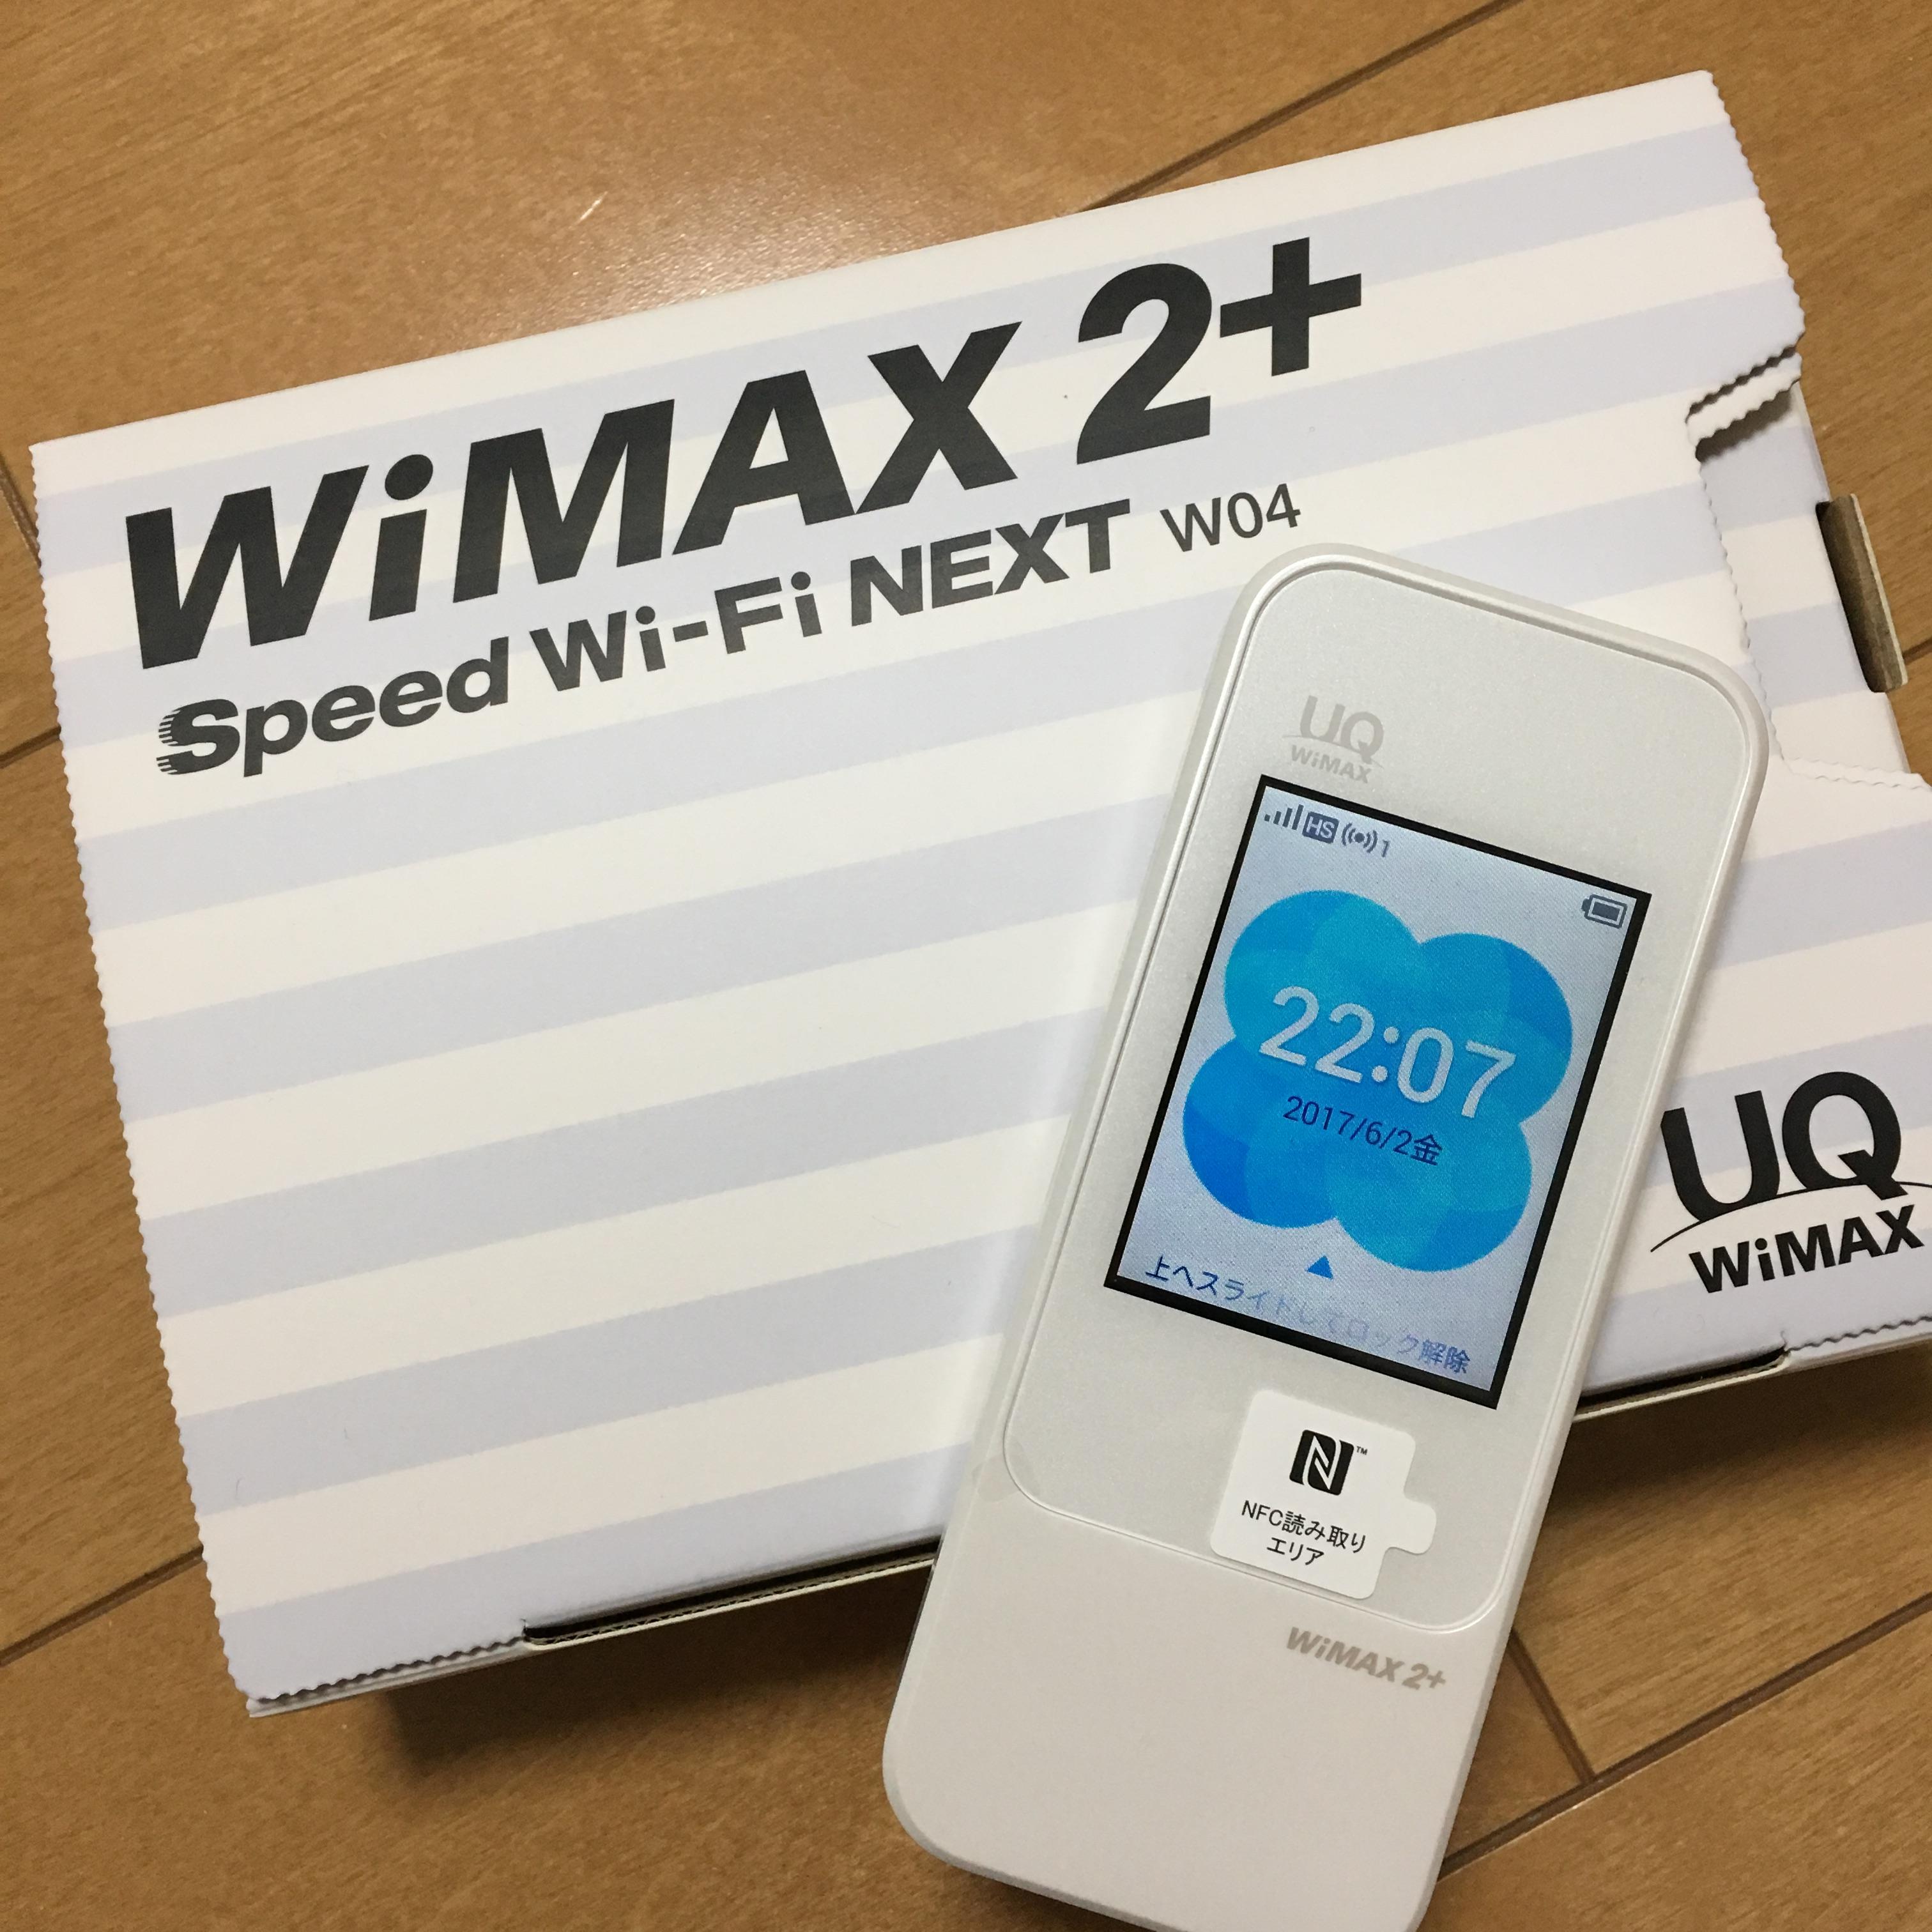 WiMAX端末W04契約発送到着まで何日?